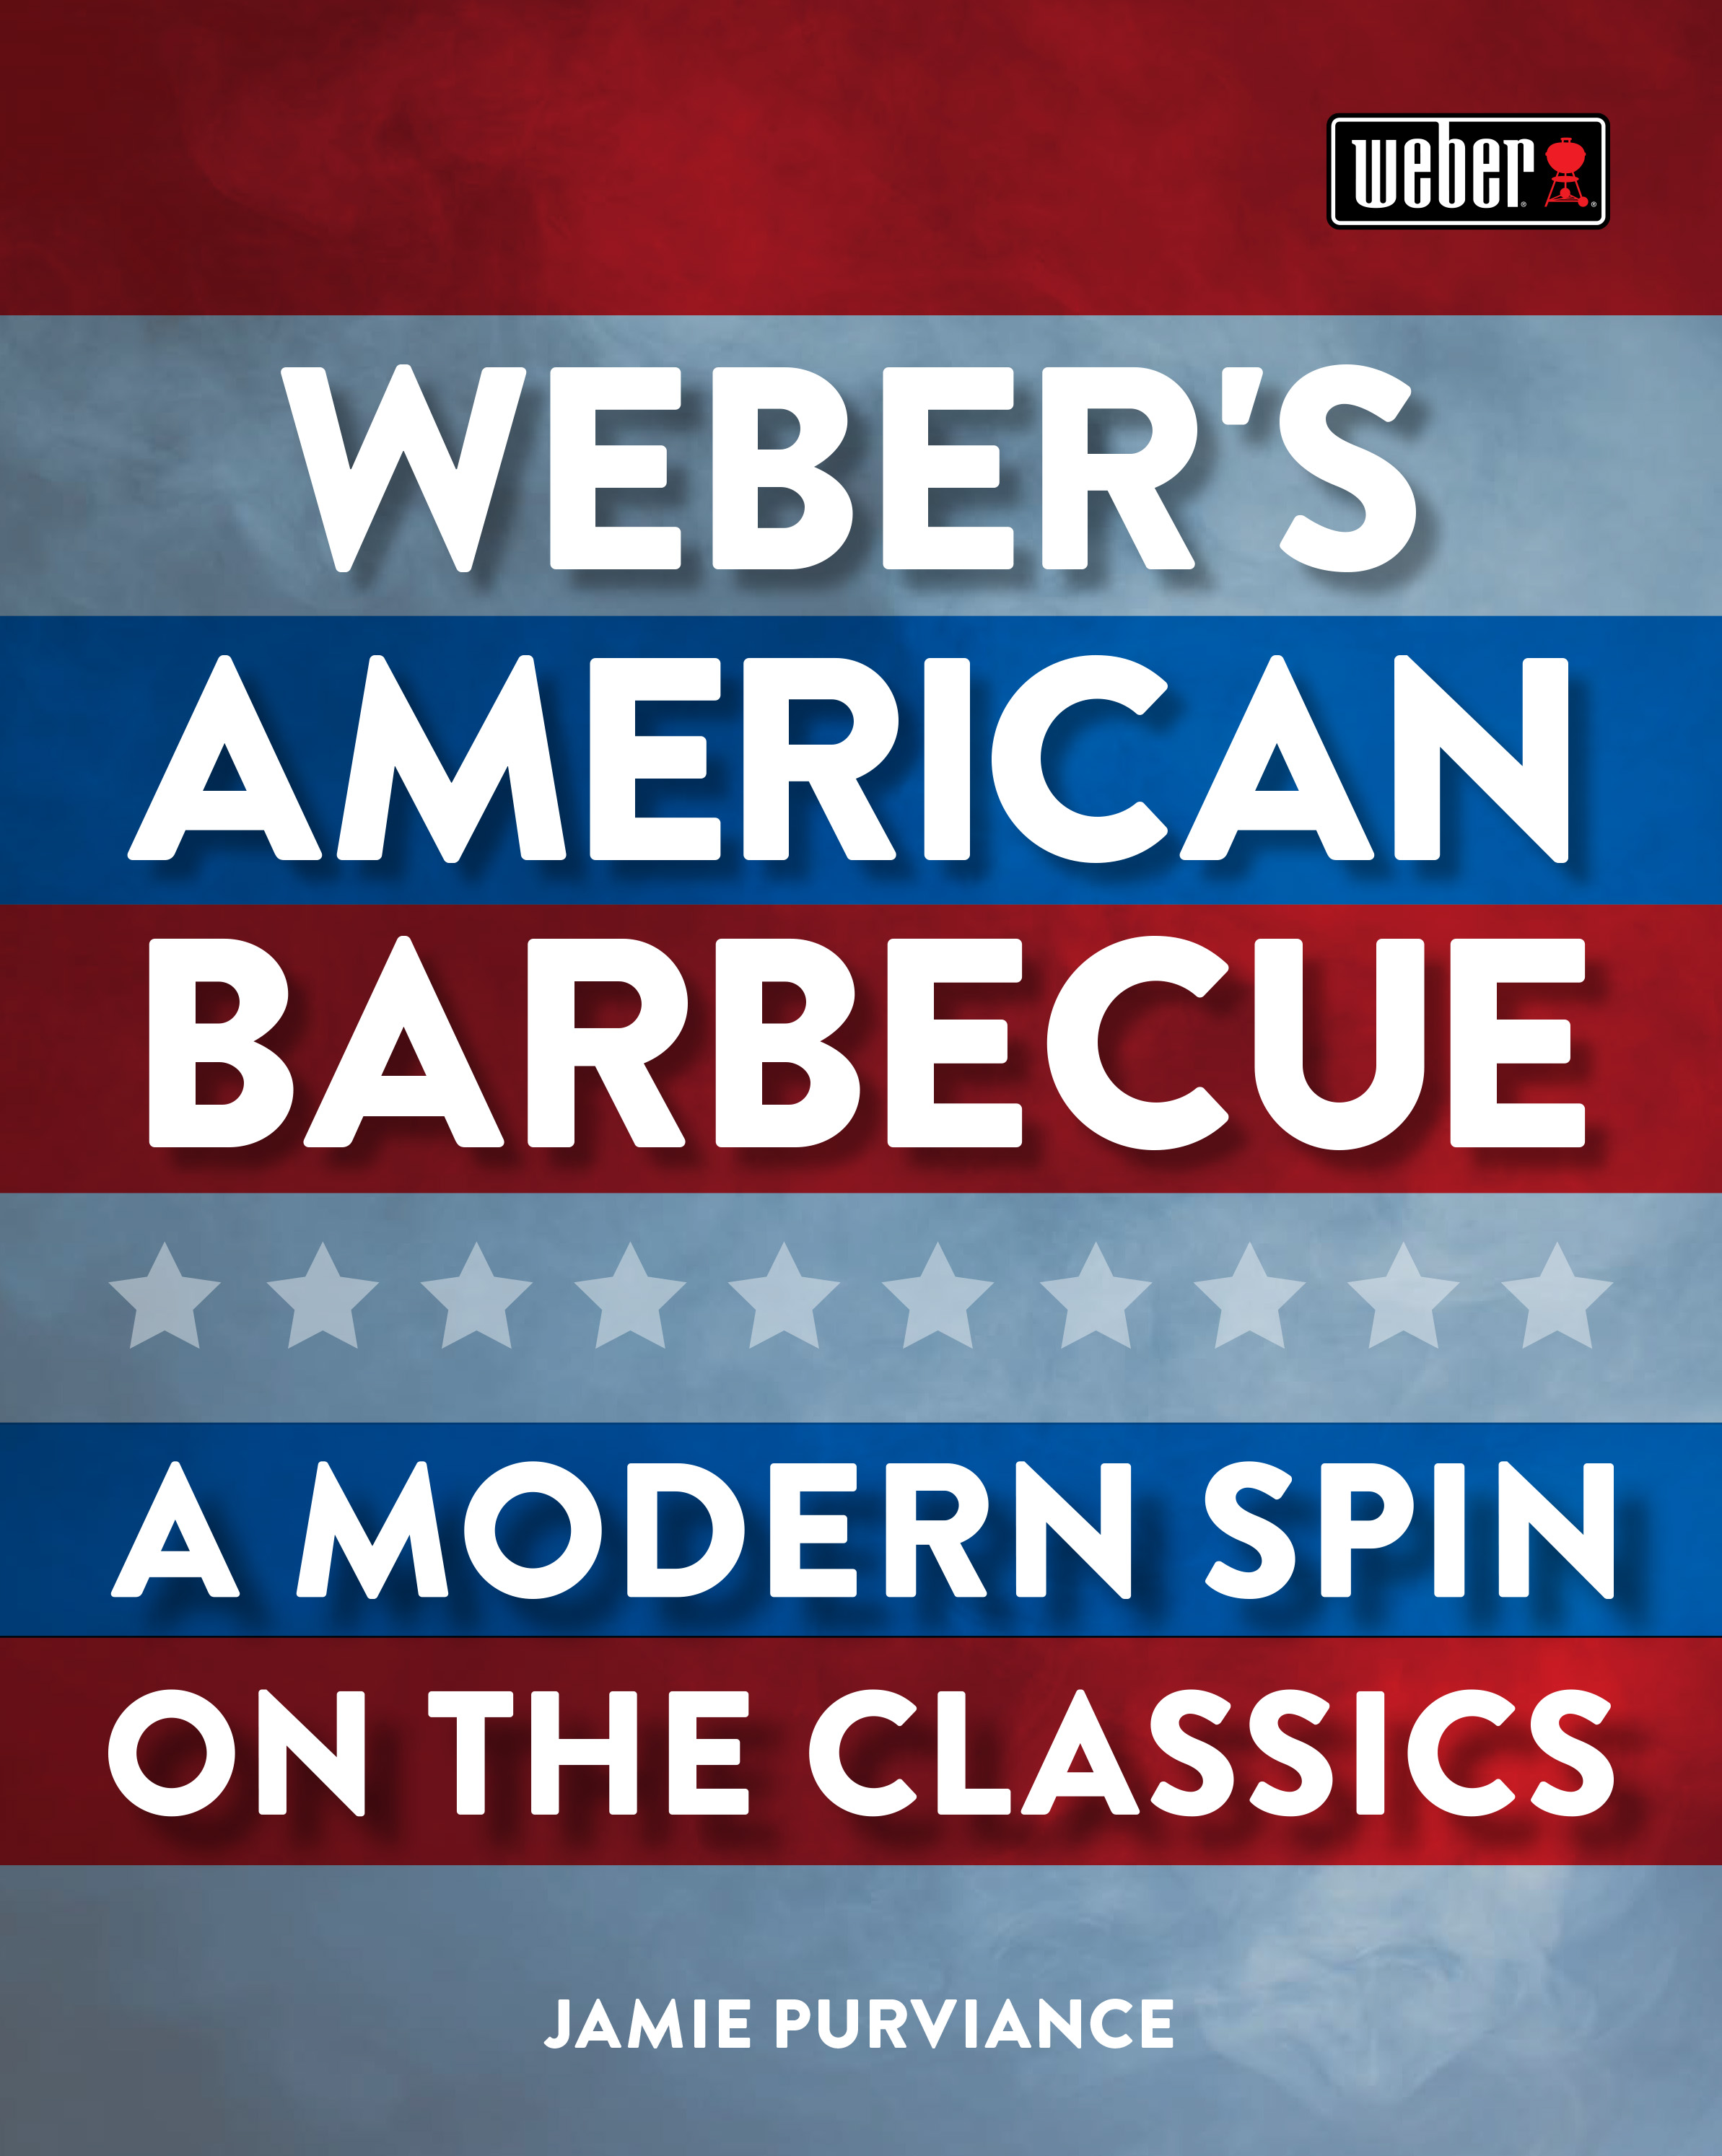 WeberAmericanBarbecue.jpg